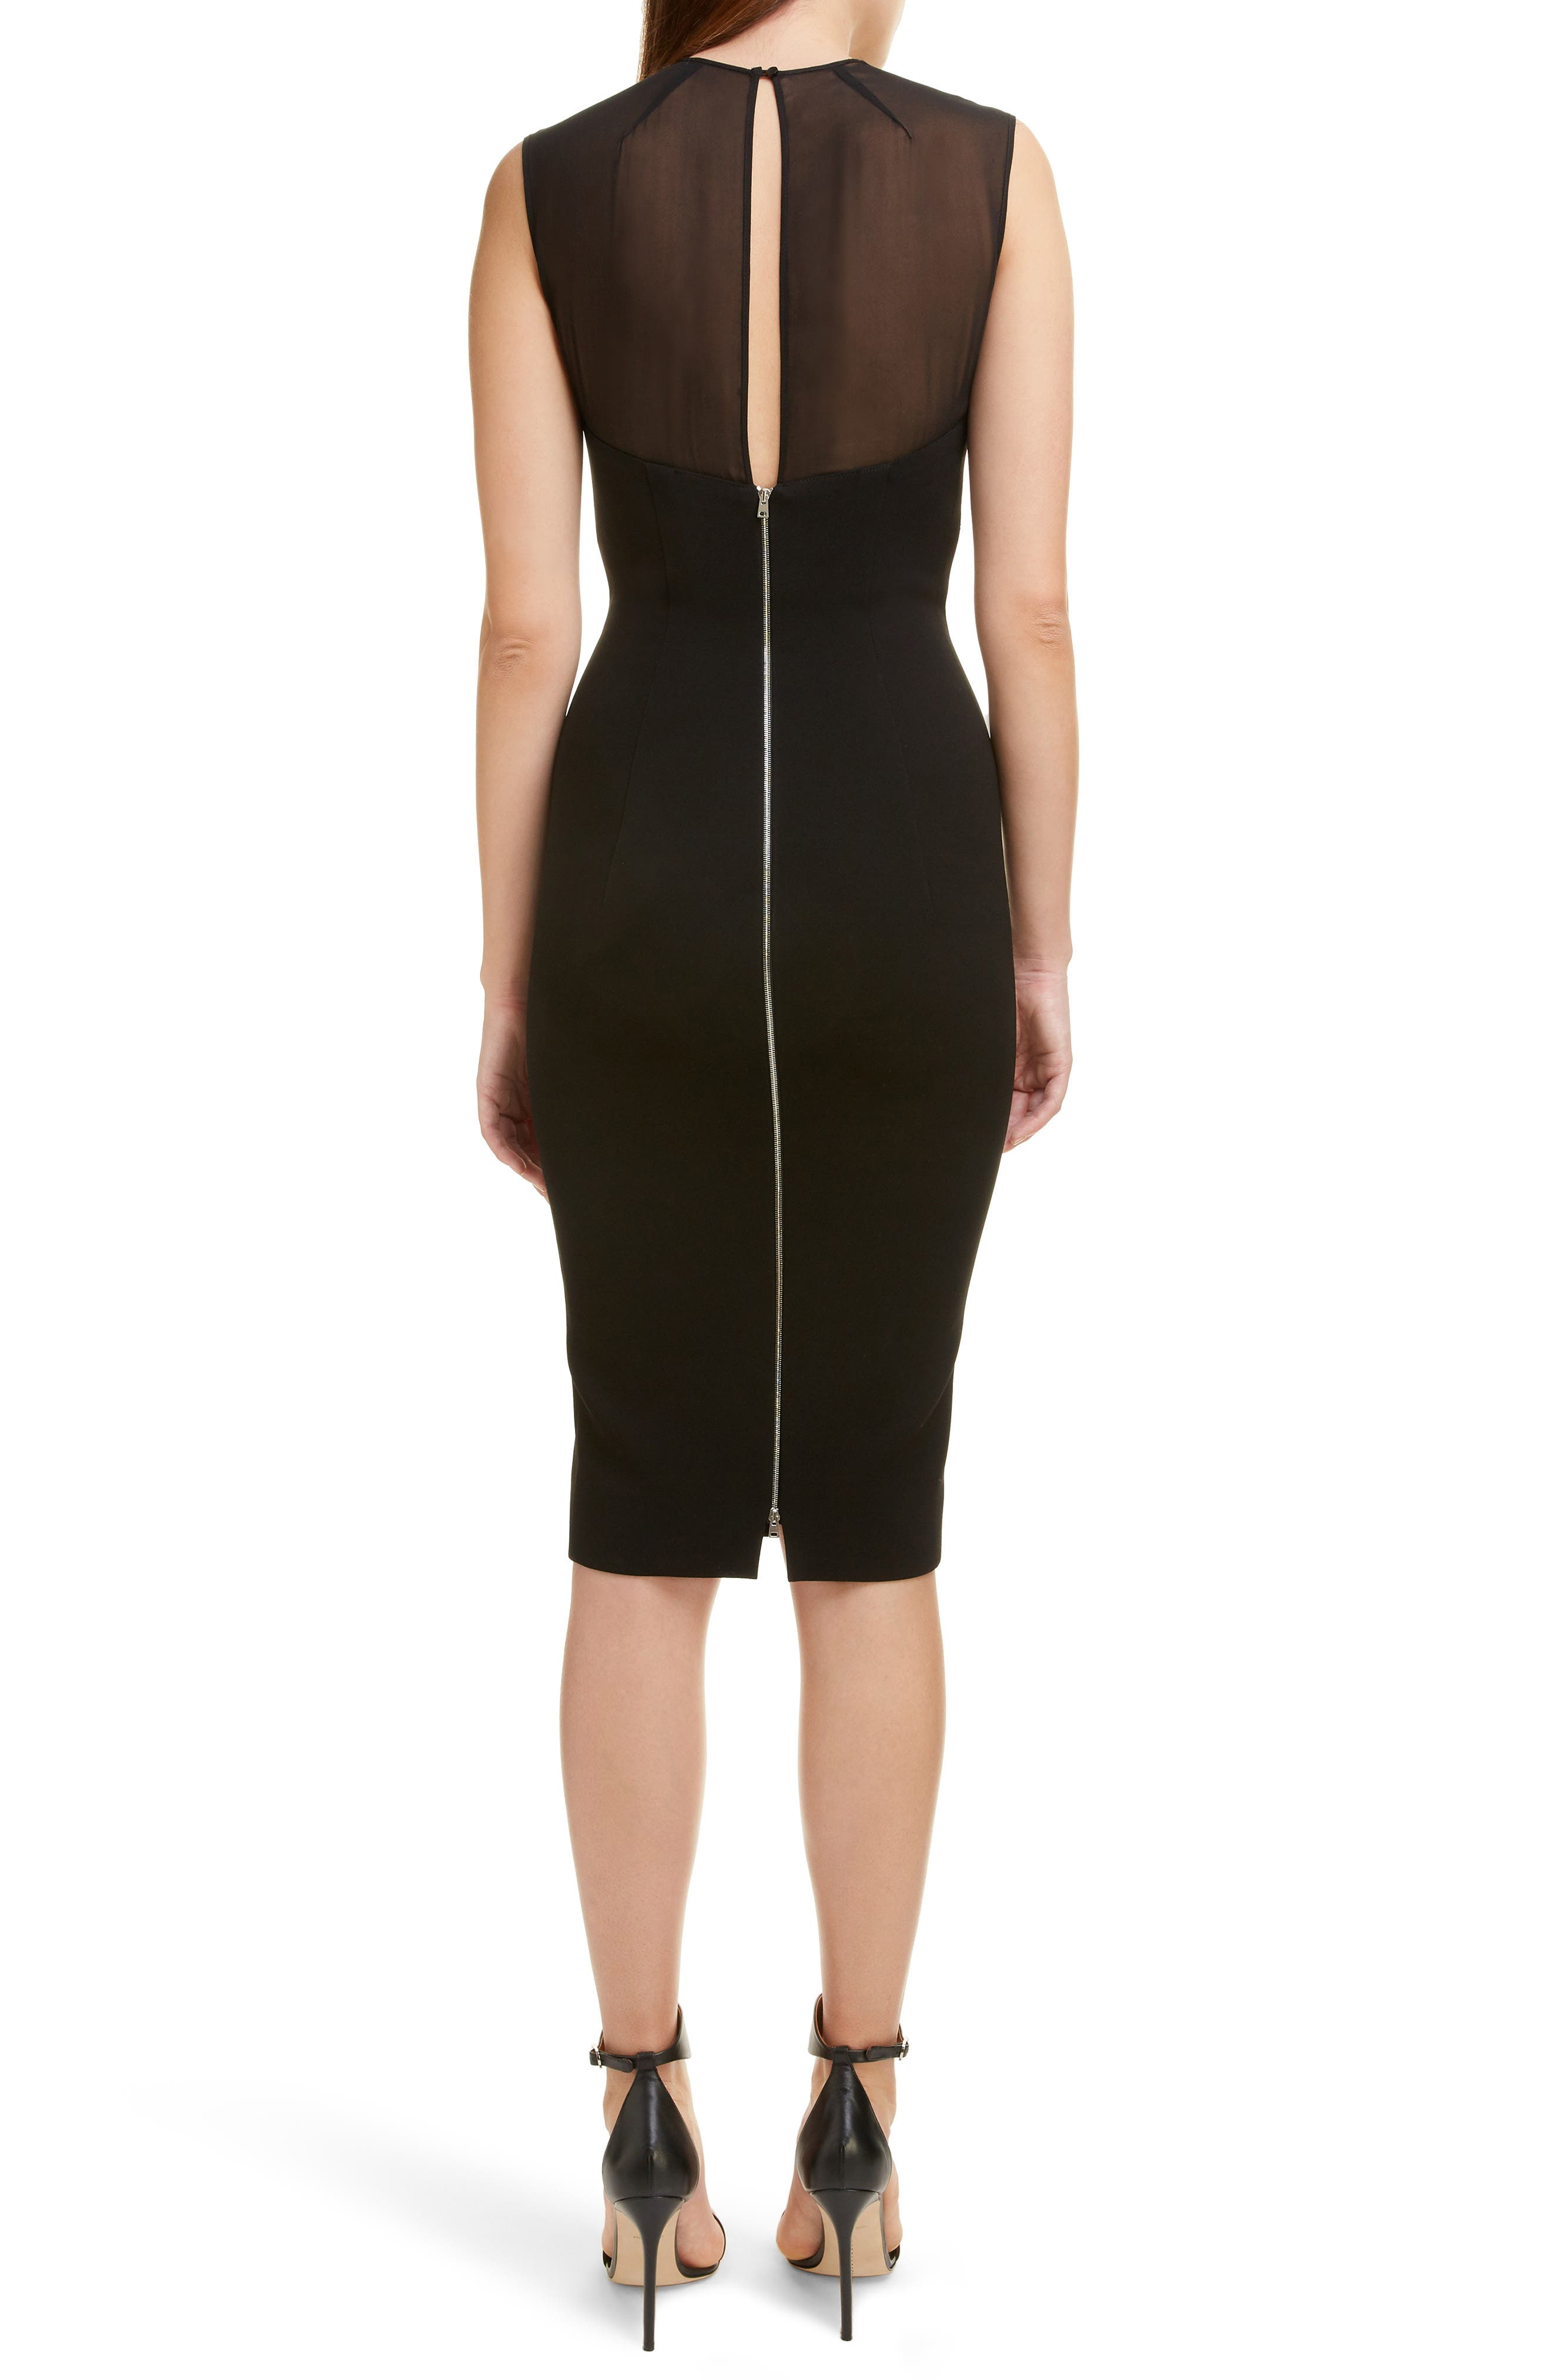 VICTORIA BECKHAM, Sheer Yoke Sheath Dress, Alternate thumbnail 2, color, BLACK